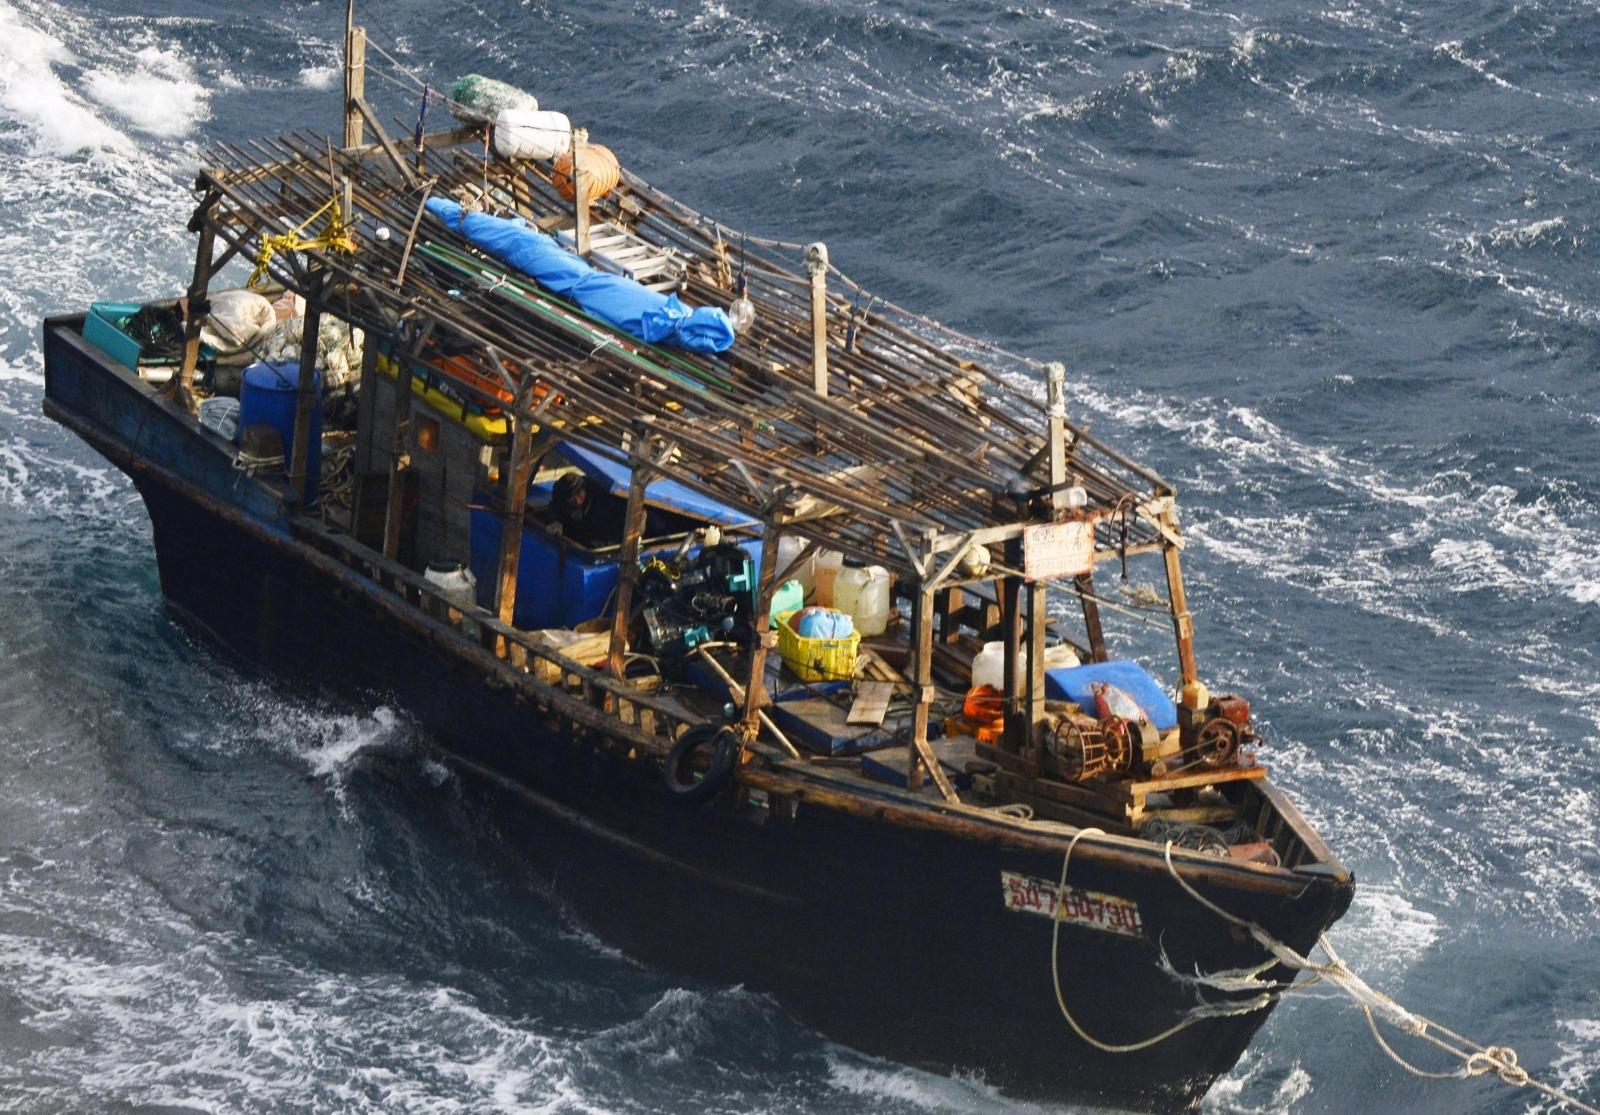 North Island Boat Co